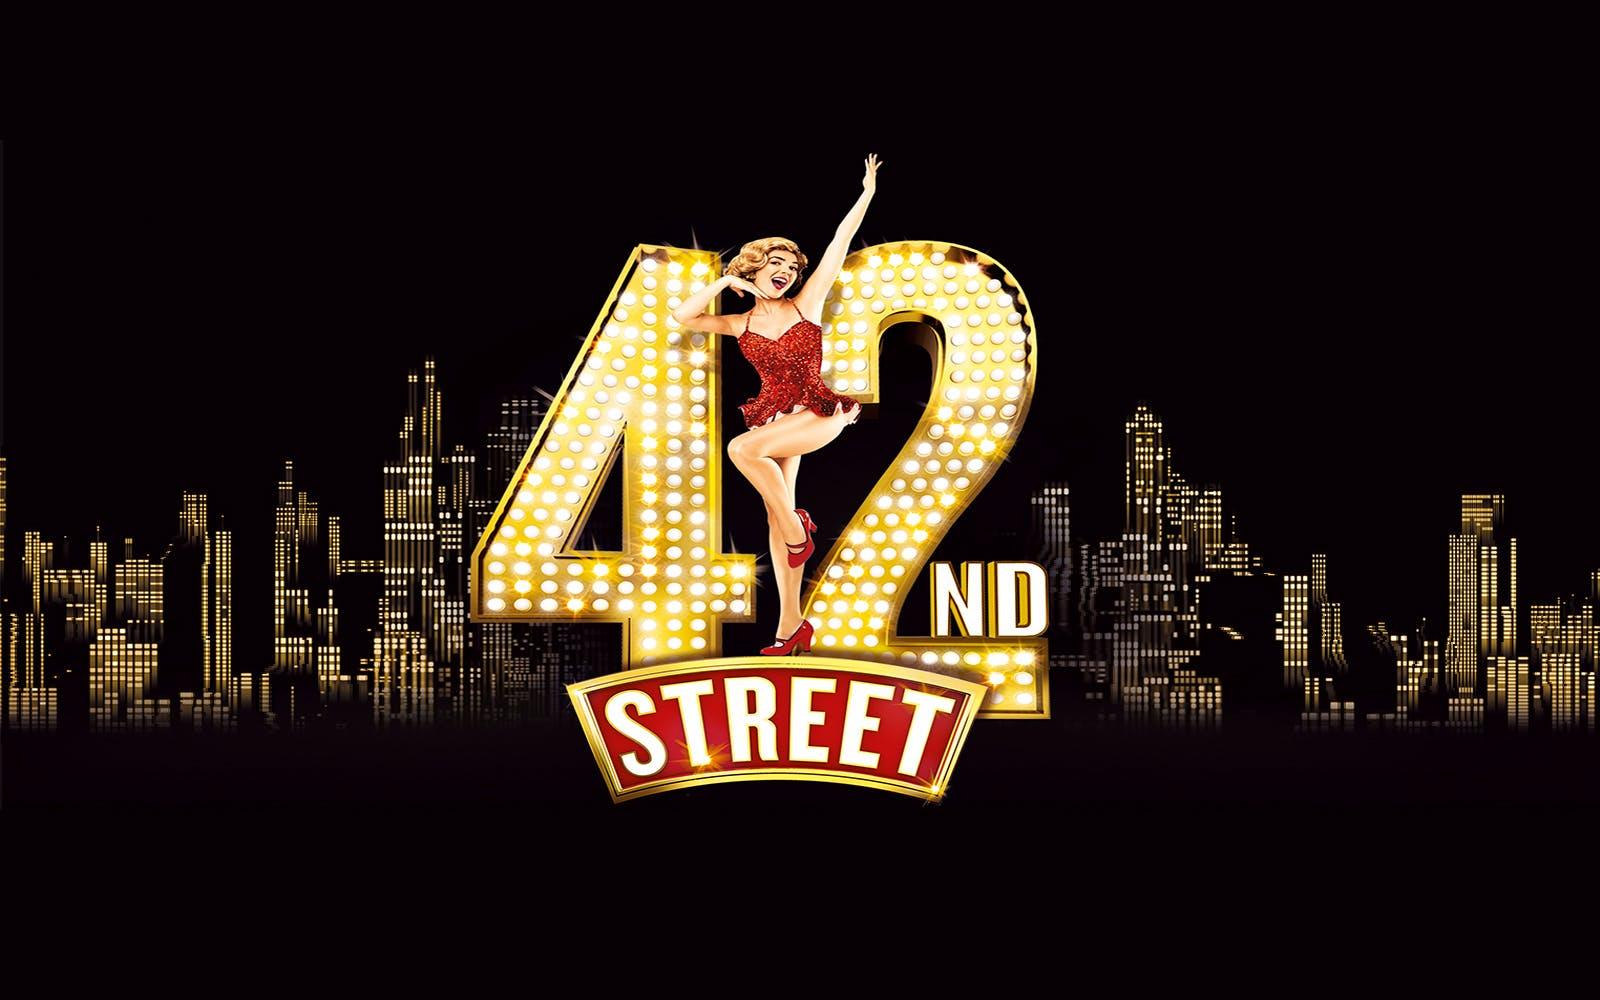 42nd street 2